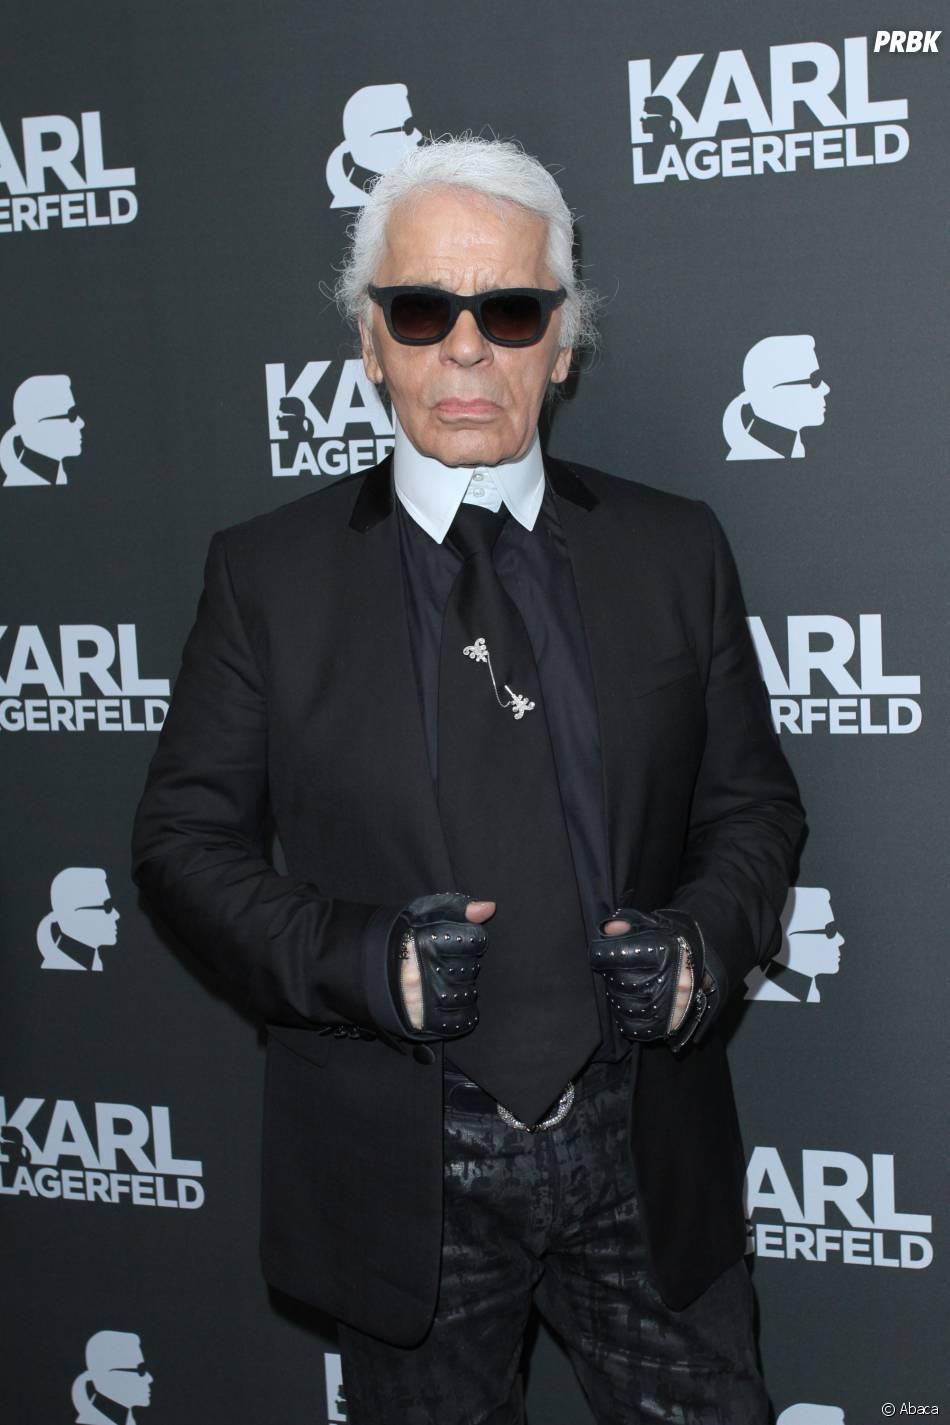 Karl Lagerfeld toujours en uniforme noir et blanc